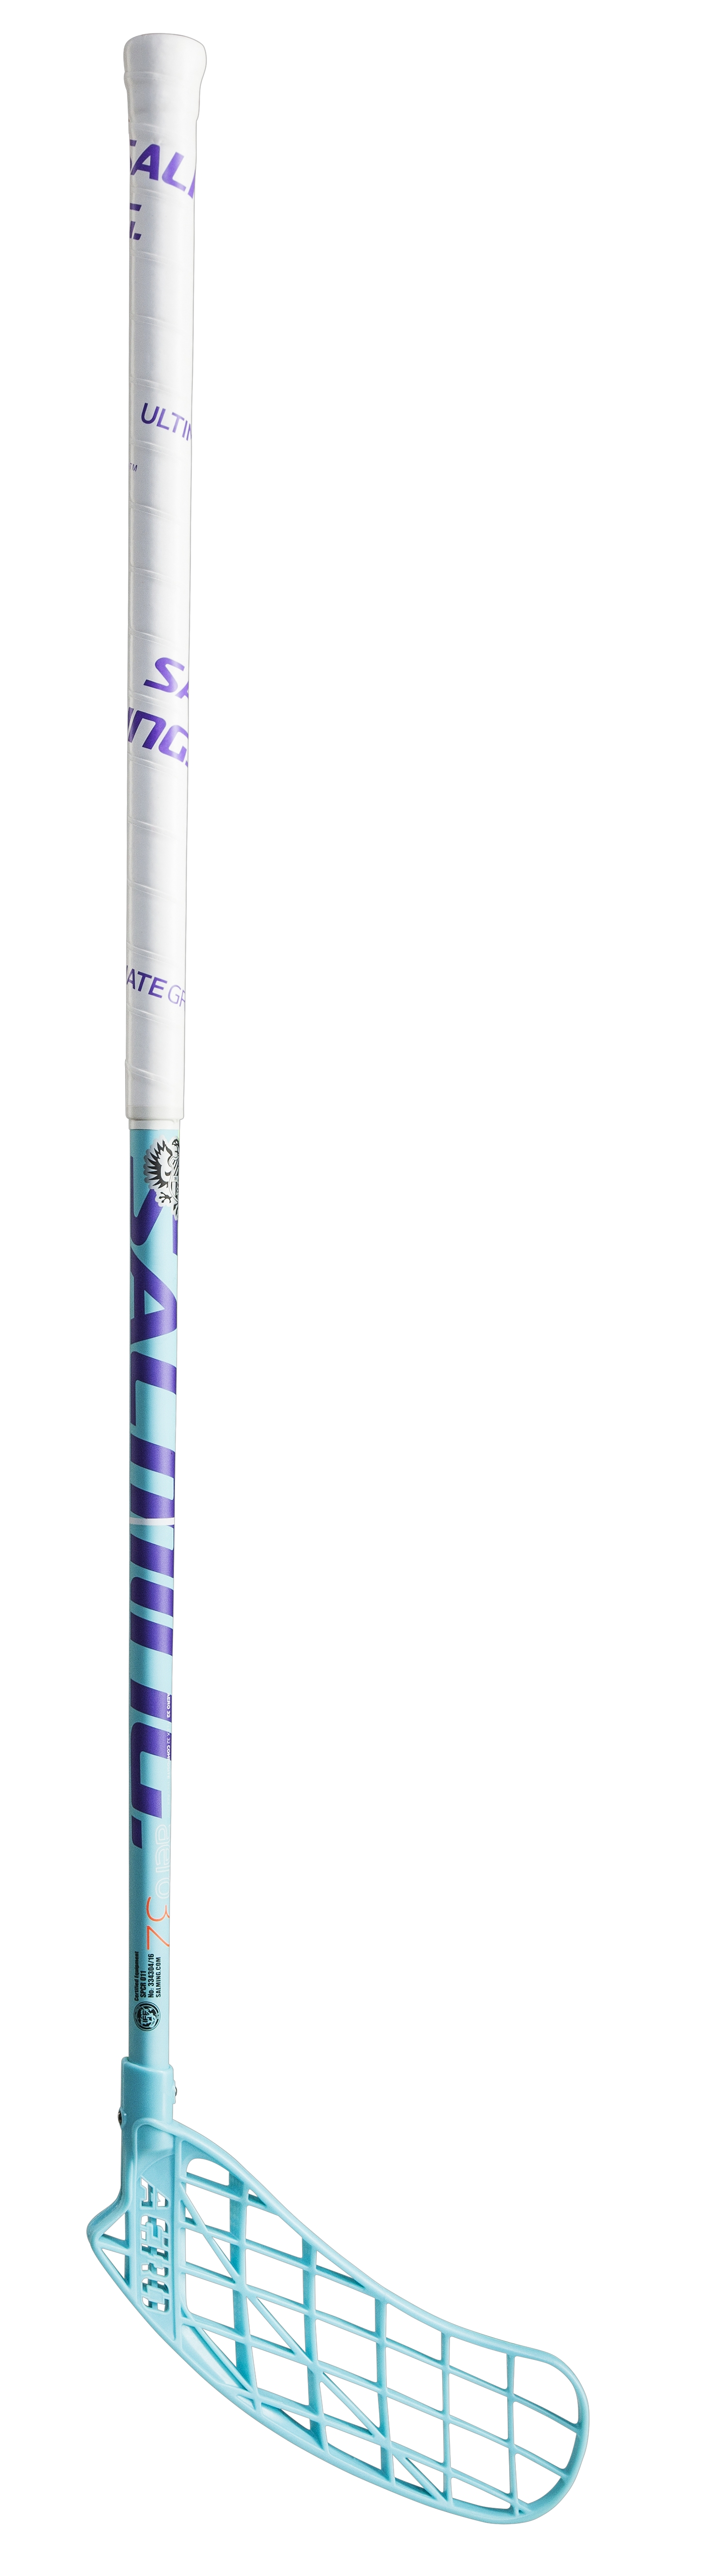 Image of   Salming Composite 32 Stick Senior Venstre